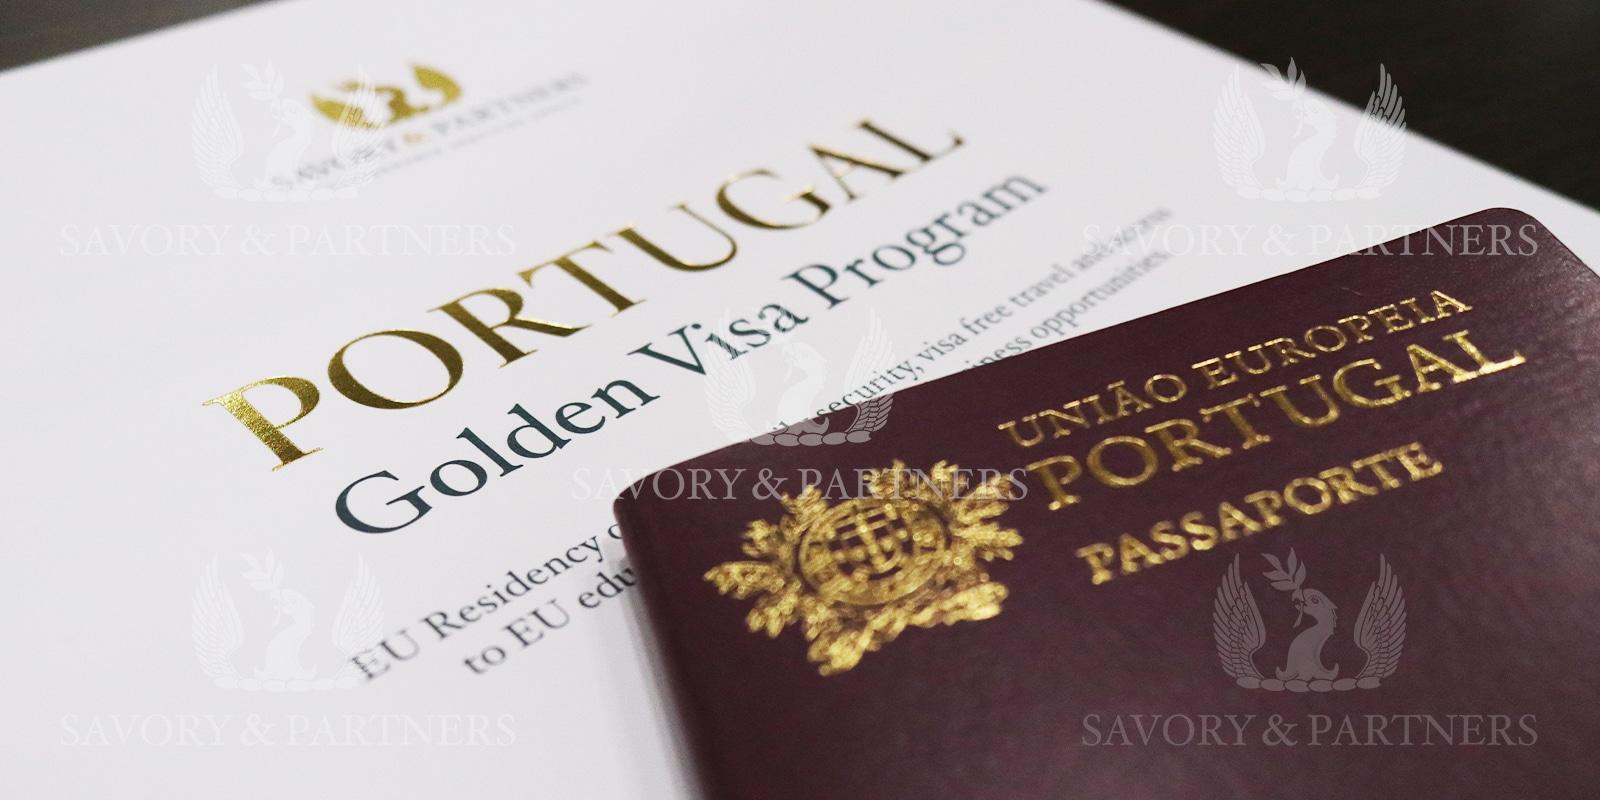 Portuguese passport at Savory & Partners office in Dubai, UAE.